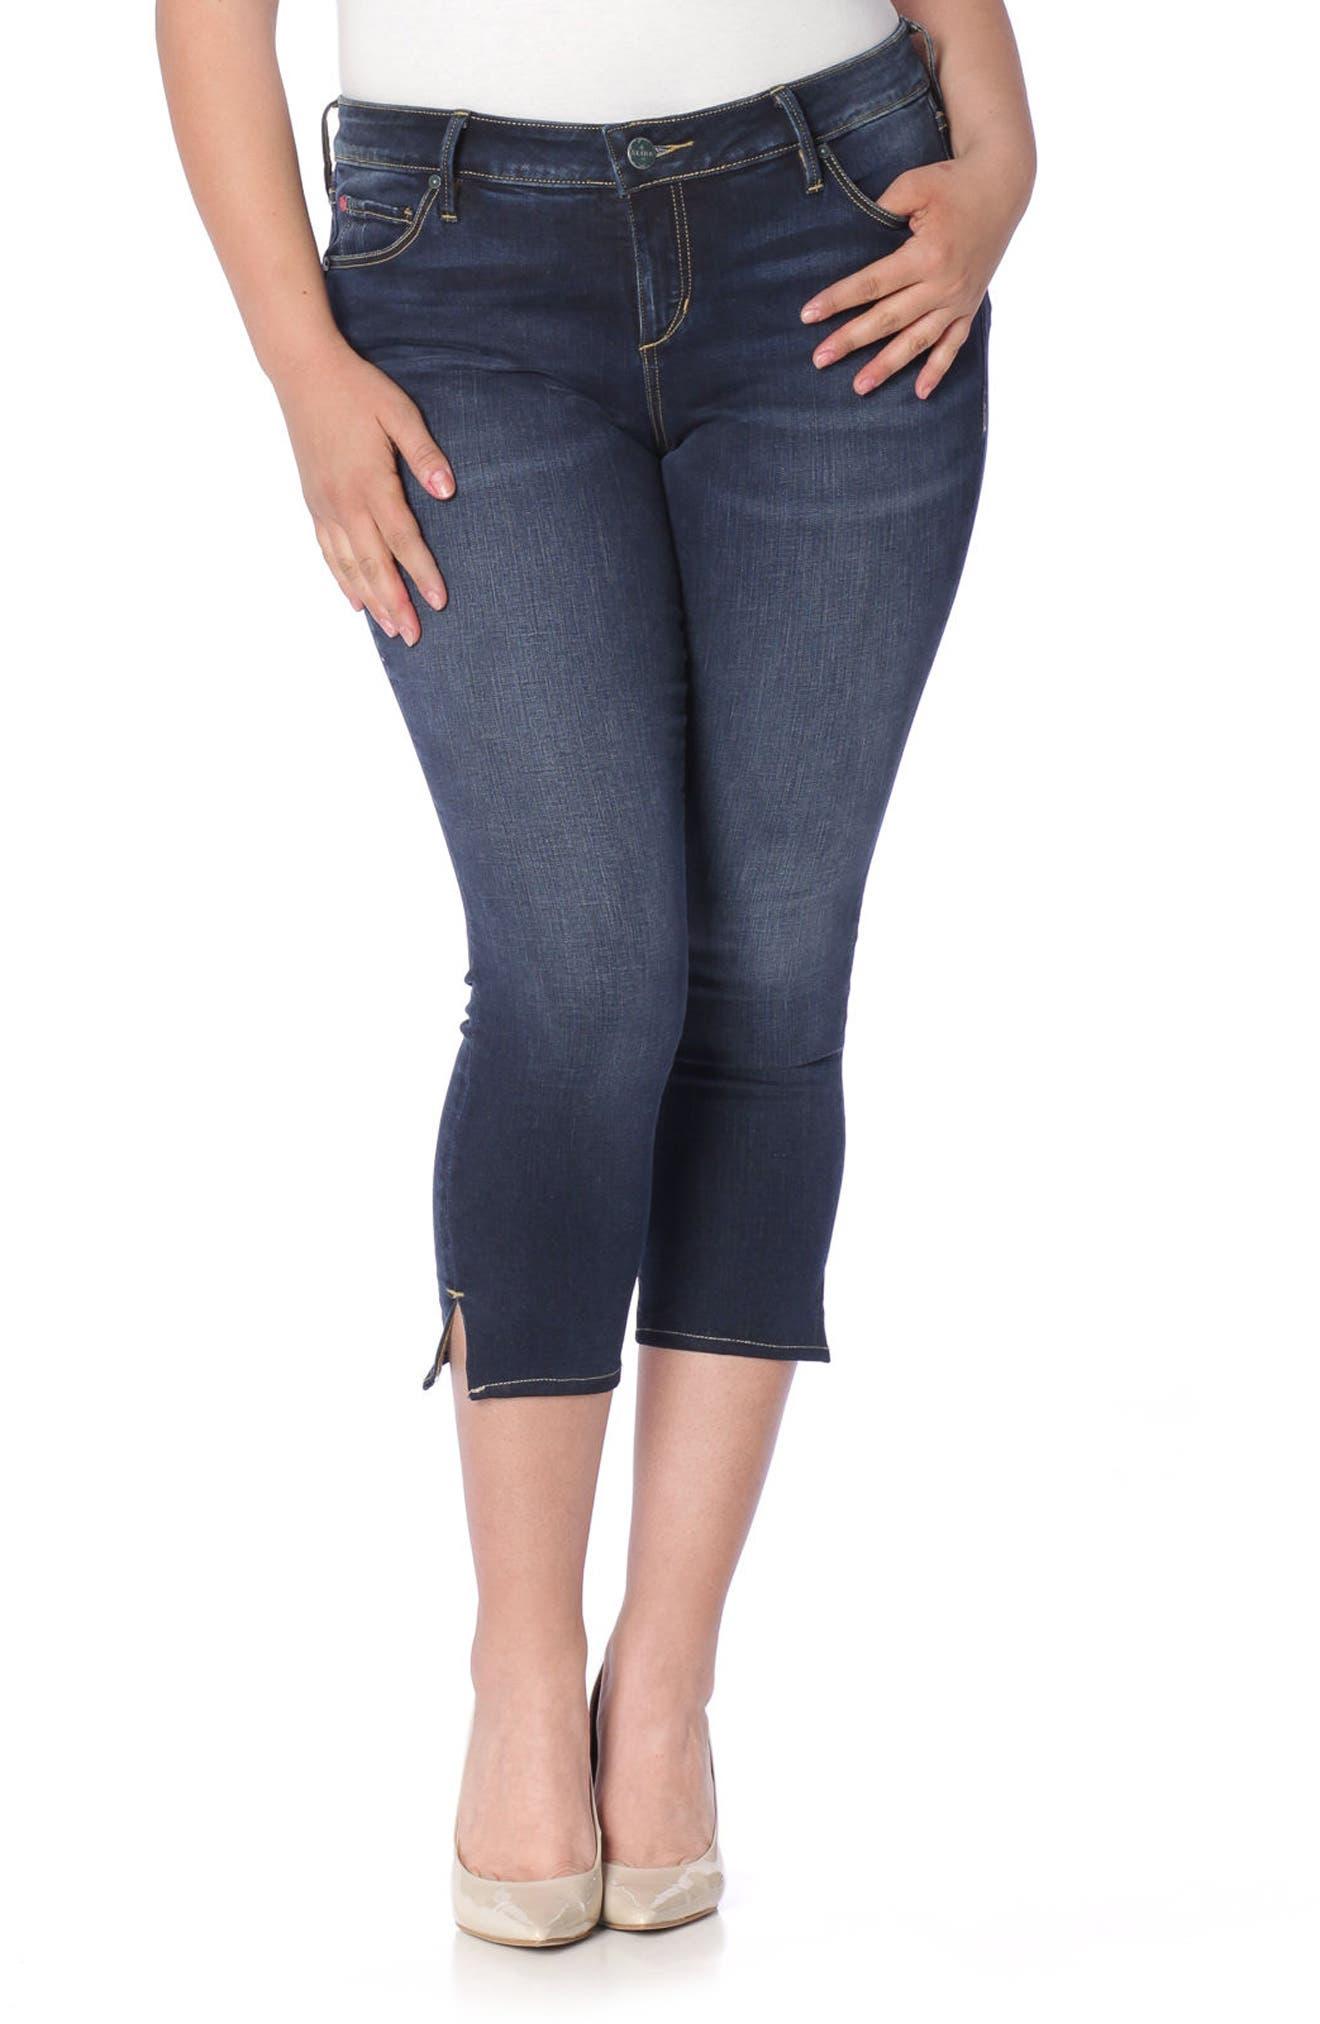 Alternate Image 1 Selected - SLINK Jeans Side Vent Crop Jeans (Amber) (Plus Size)